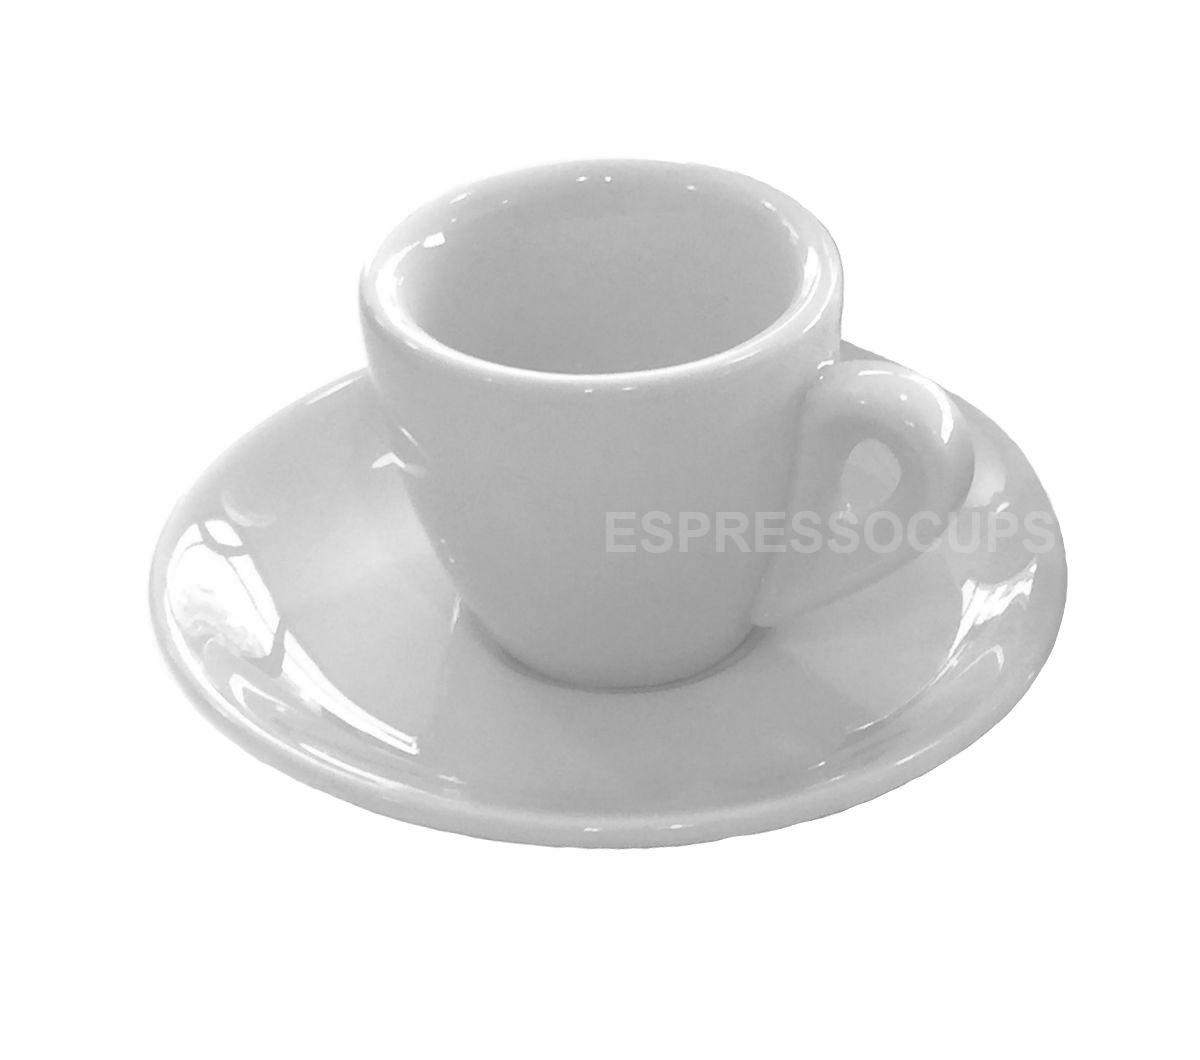 espresso cups  espressocups pte ltd - ottavia espresso cups  white